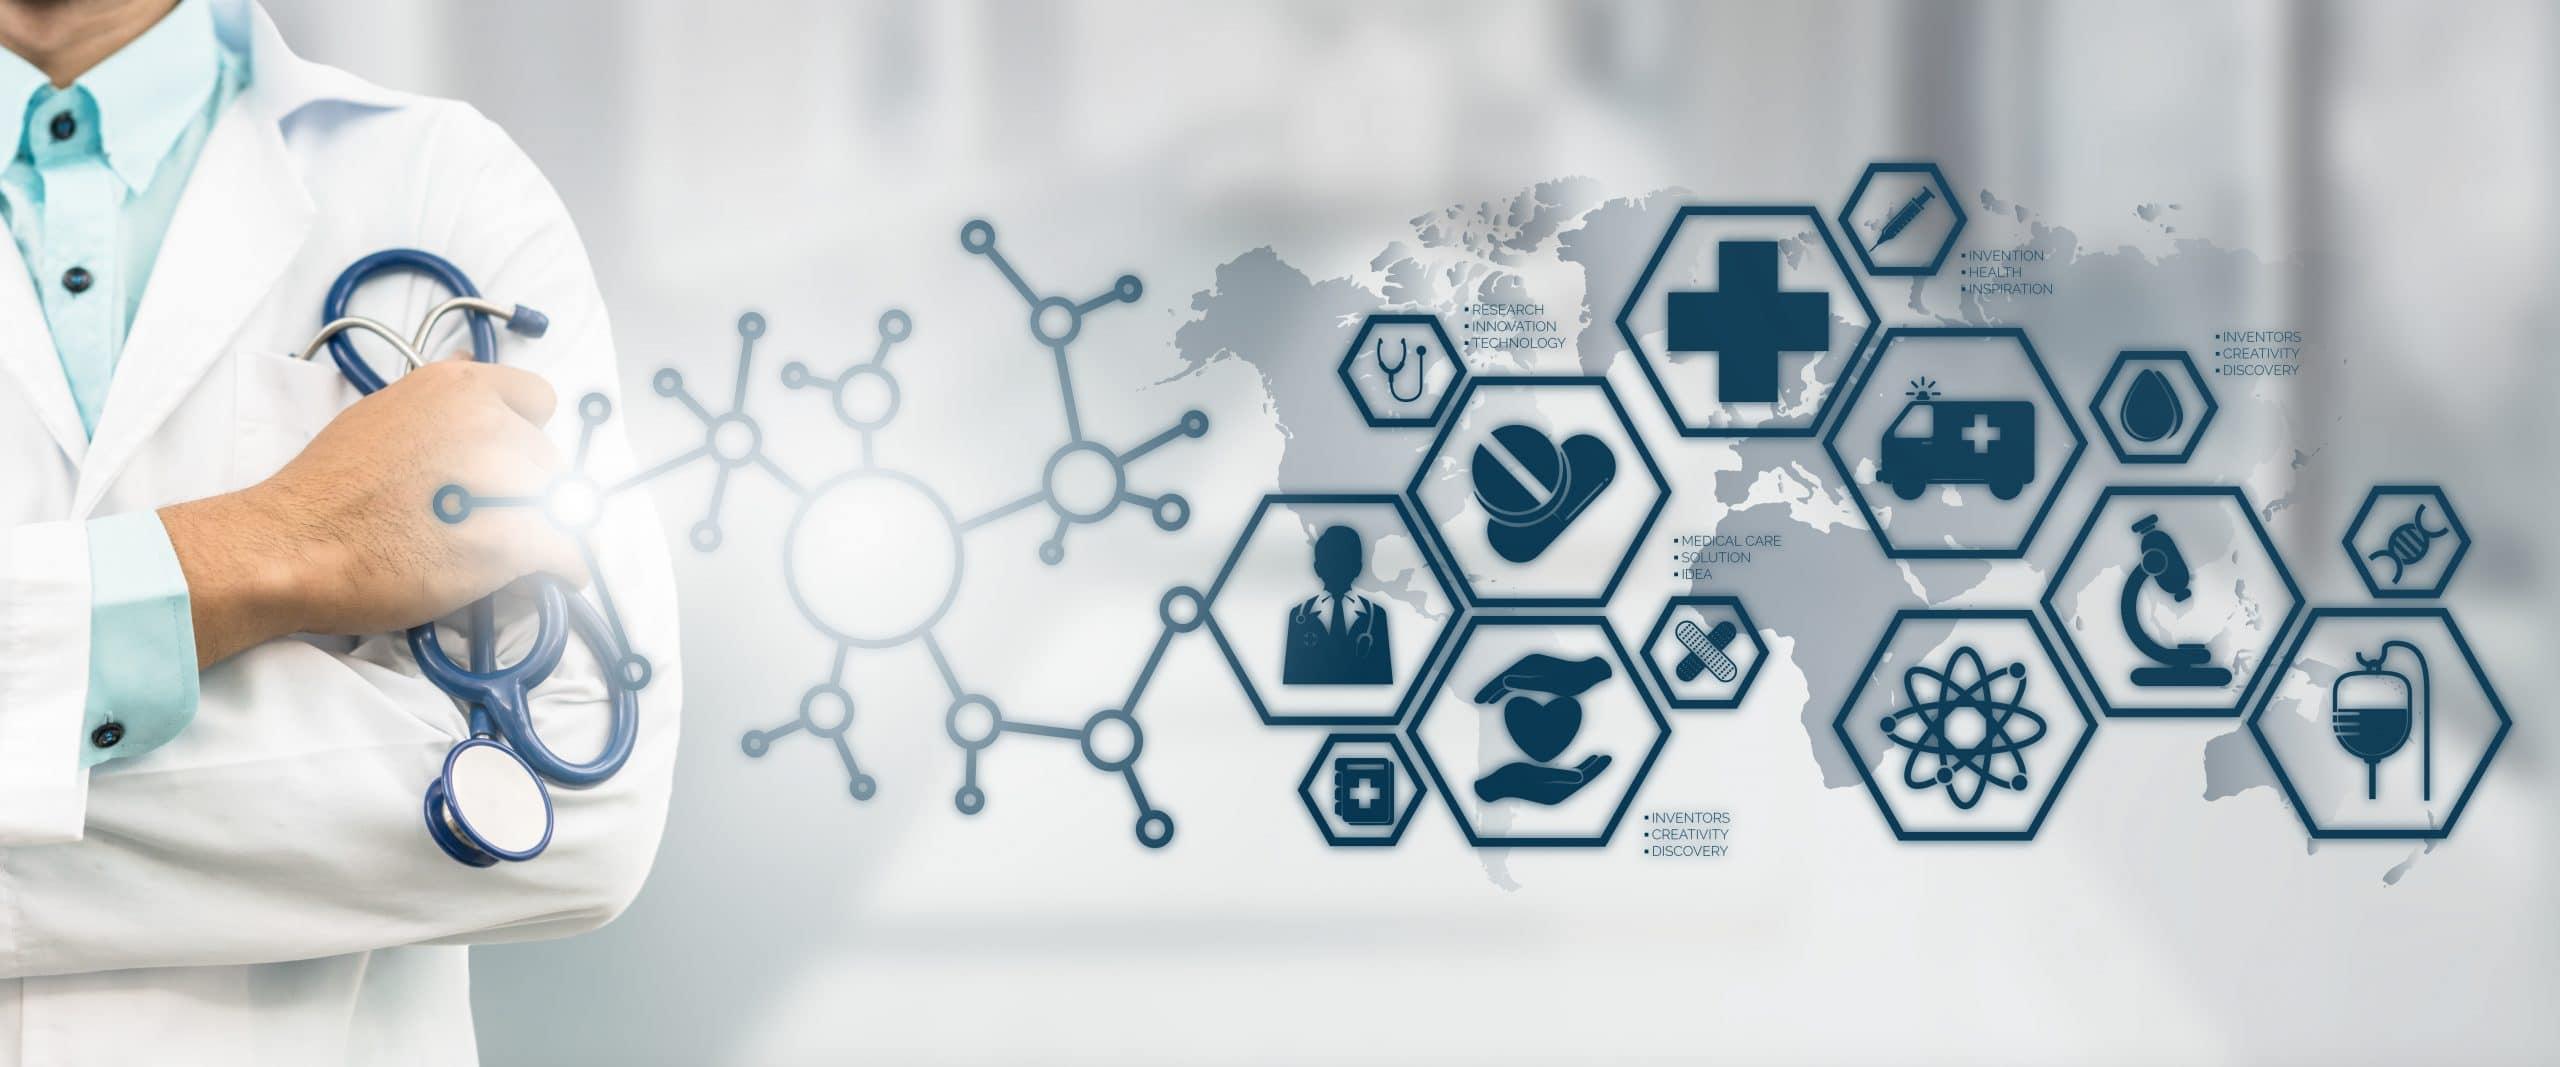 Medical Healthcare Concept